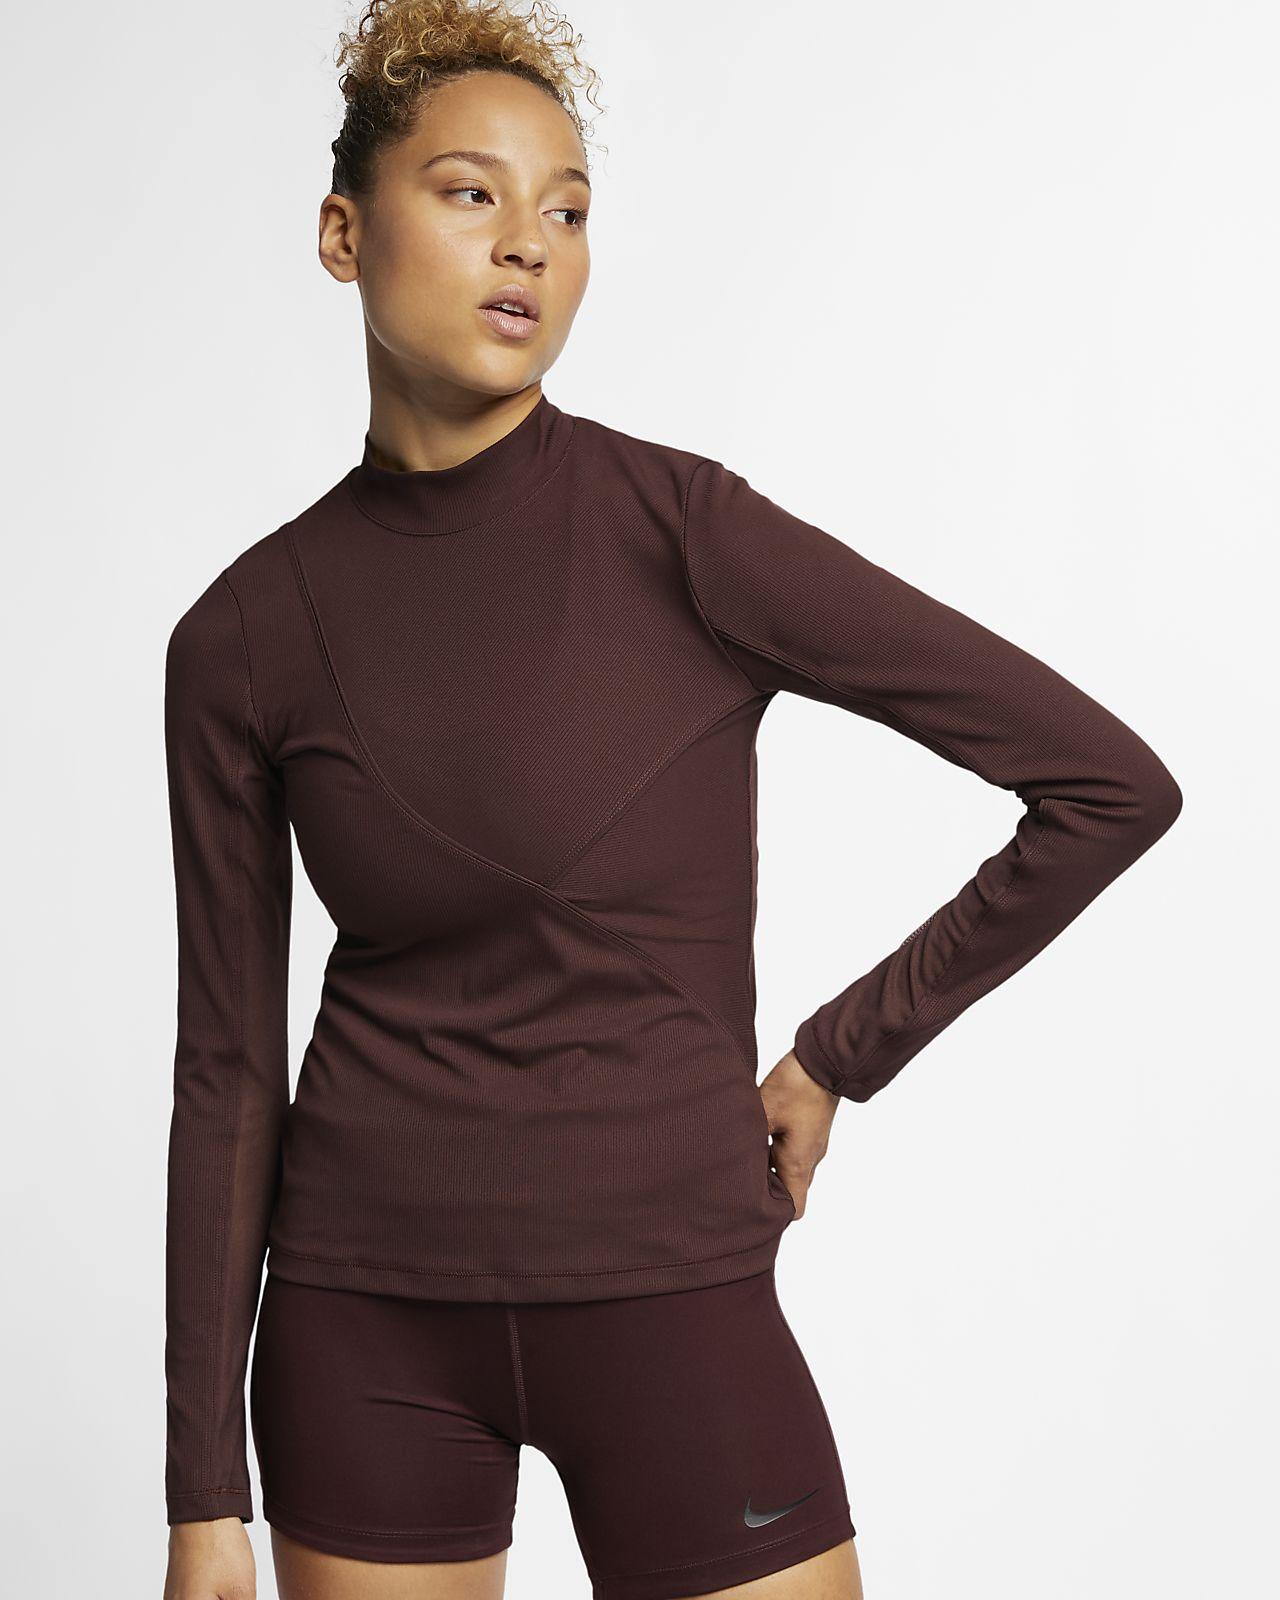 Nike Pro HyperCool Ribbed 女子长袖训练上衣